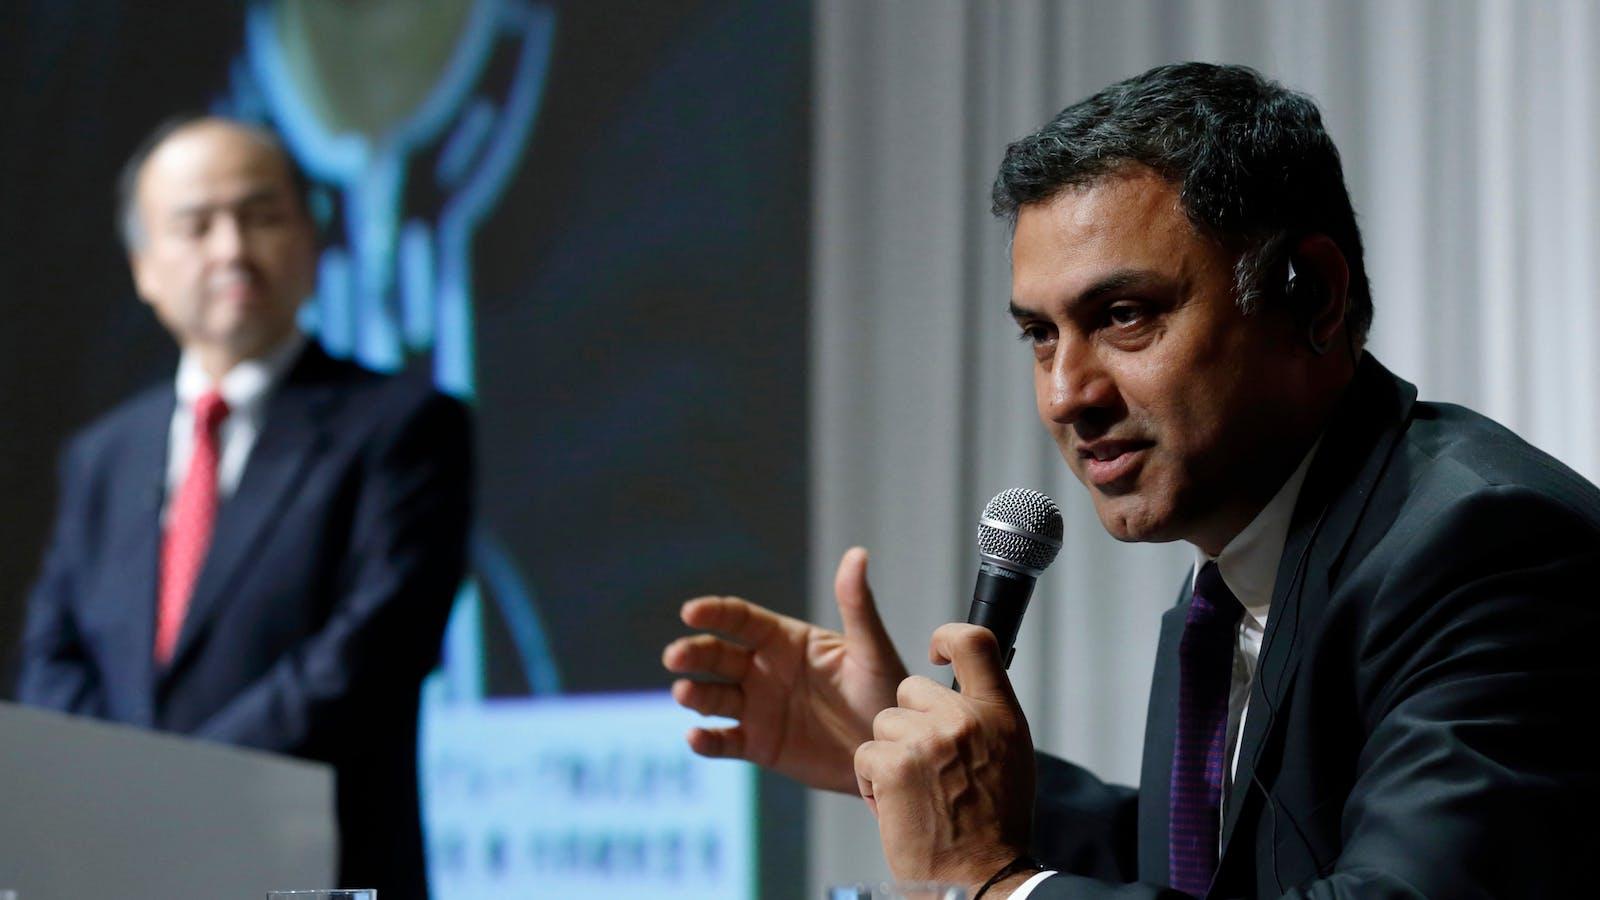 SoftBank's investment chief, Nikesh Arora, right. Photo by Bloomberg.